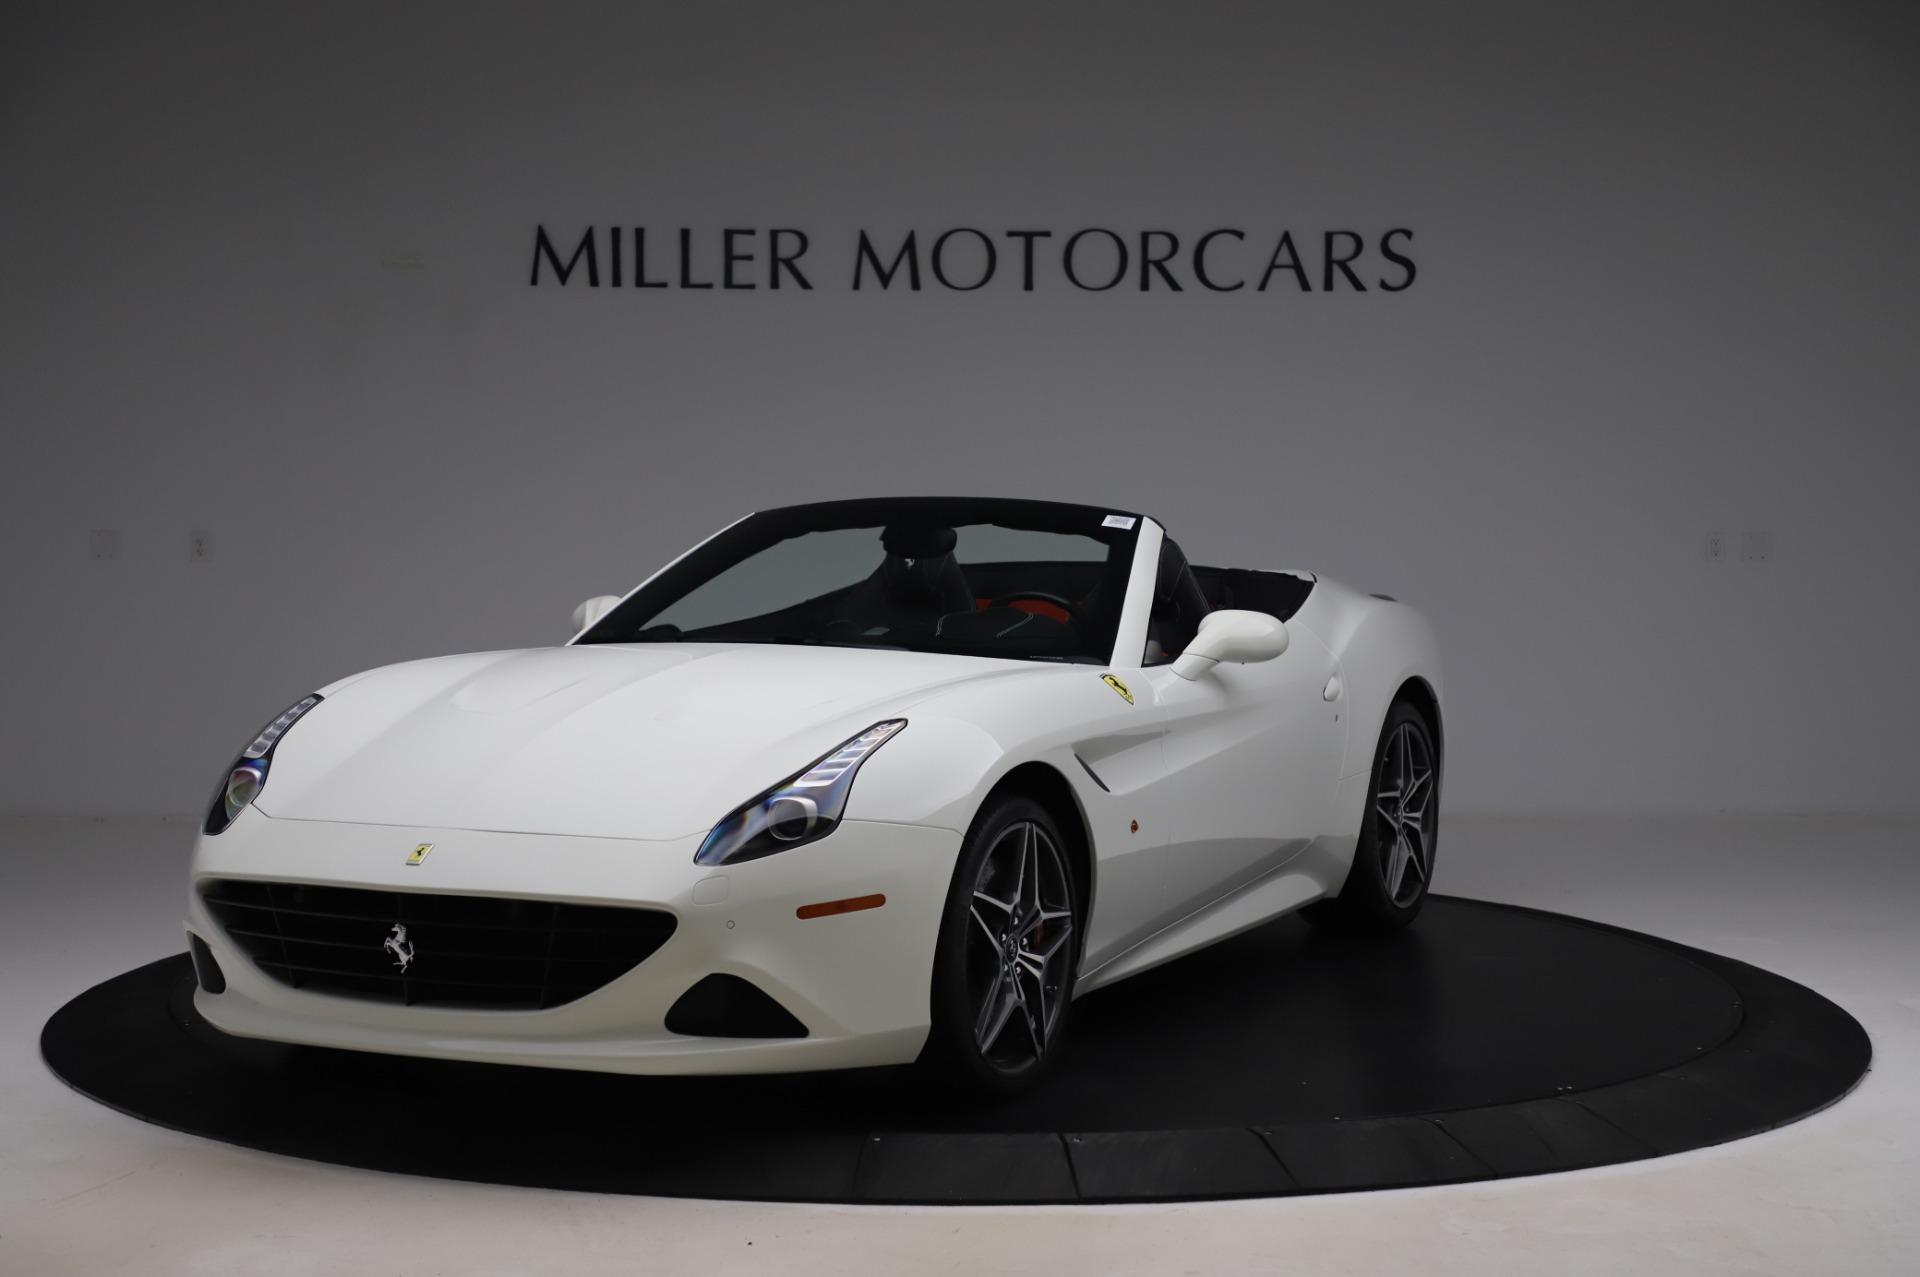 Used 2015 Ferrari California T for sale $159,900 at Aston Martin of Greenwich in Greenwich CT 06830 1